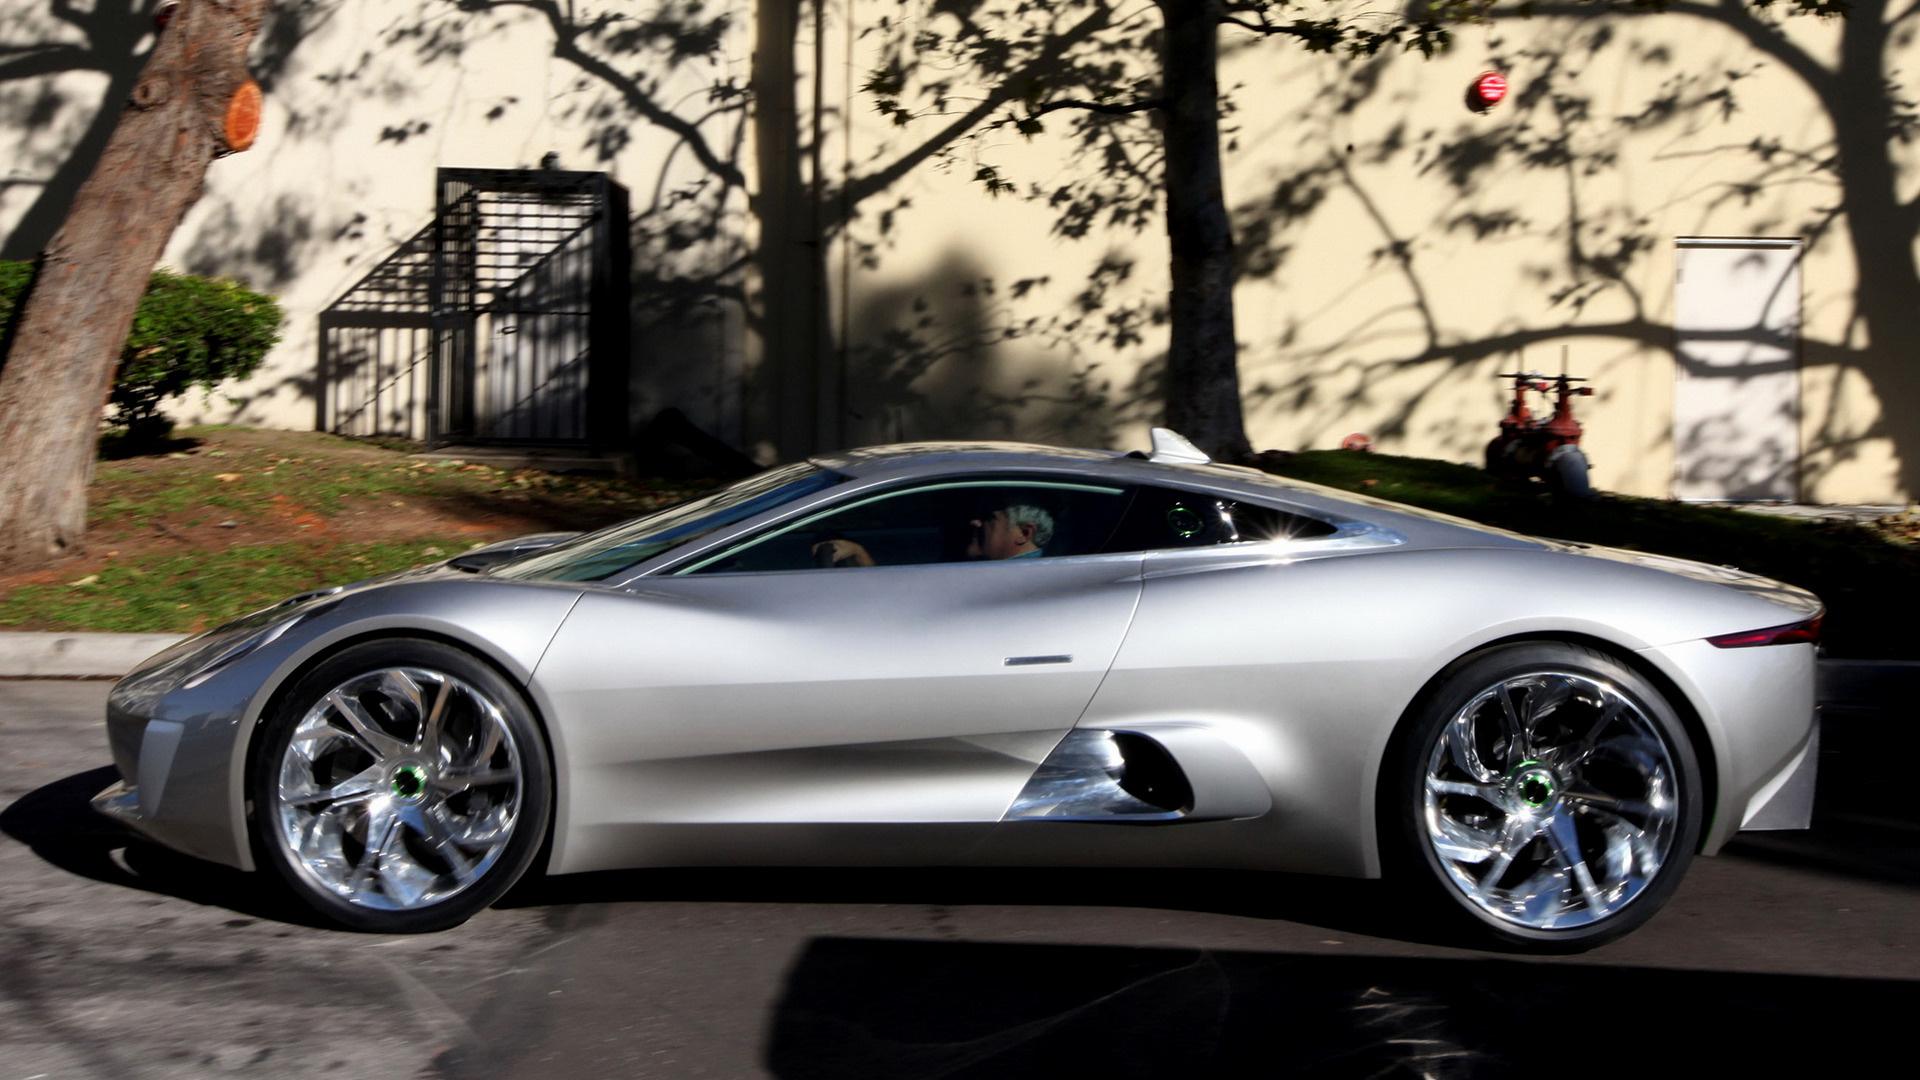 2010 Jaguar C X75 Concept Wallpapers And Hd Images Car Pixel